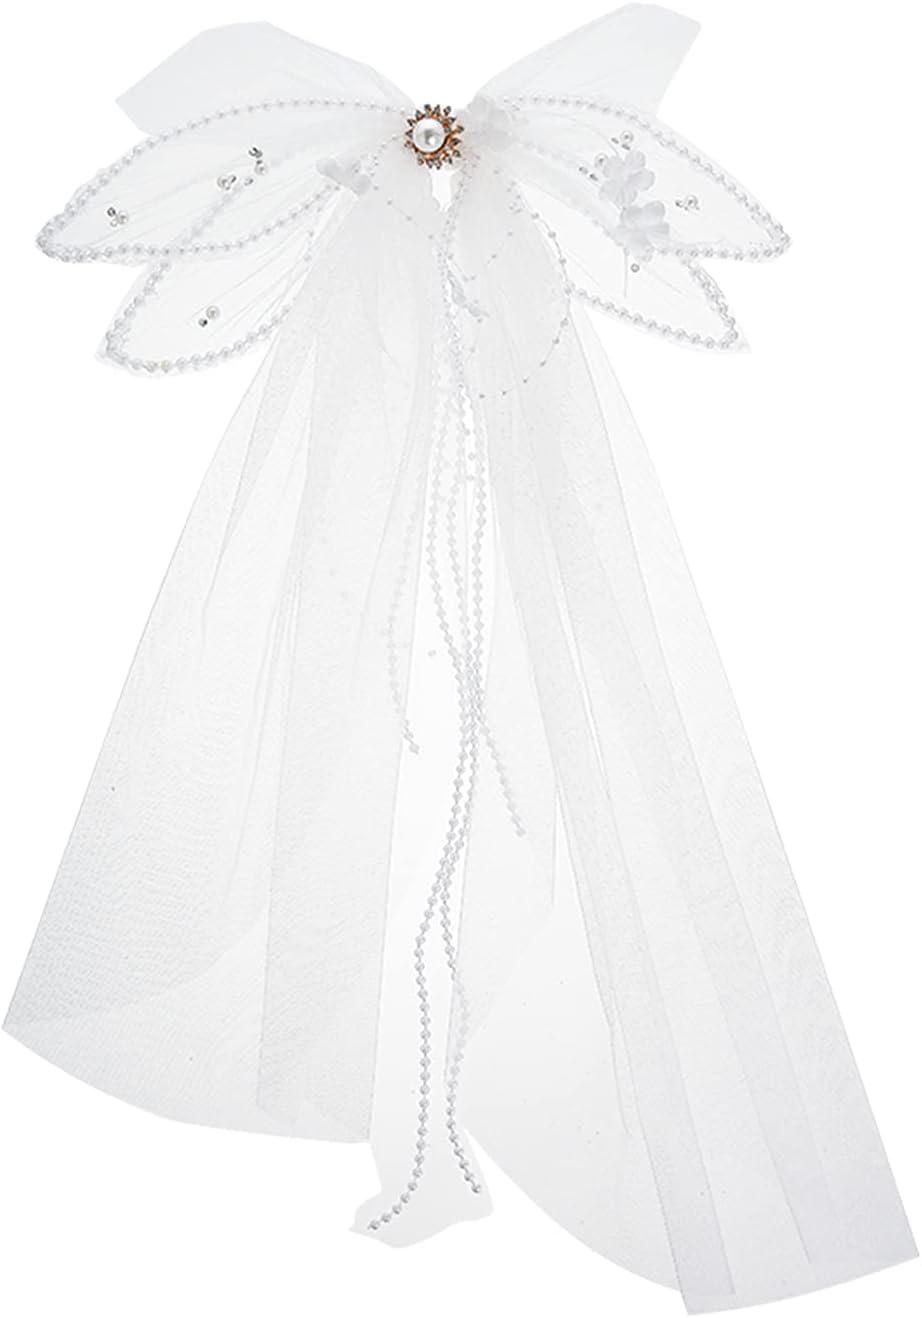 HEMOTONE Ladies Hair Max 78% OFF Accessories Wedding Headdress Baltimore Mall Bridal A